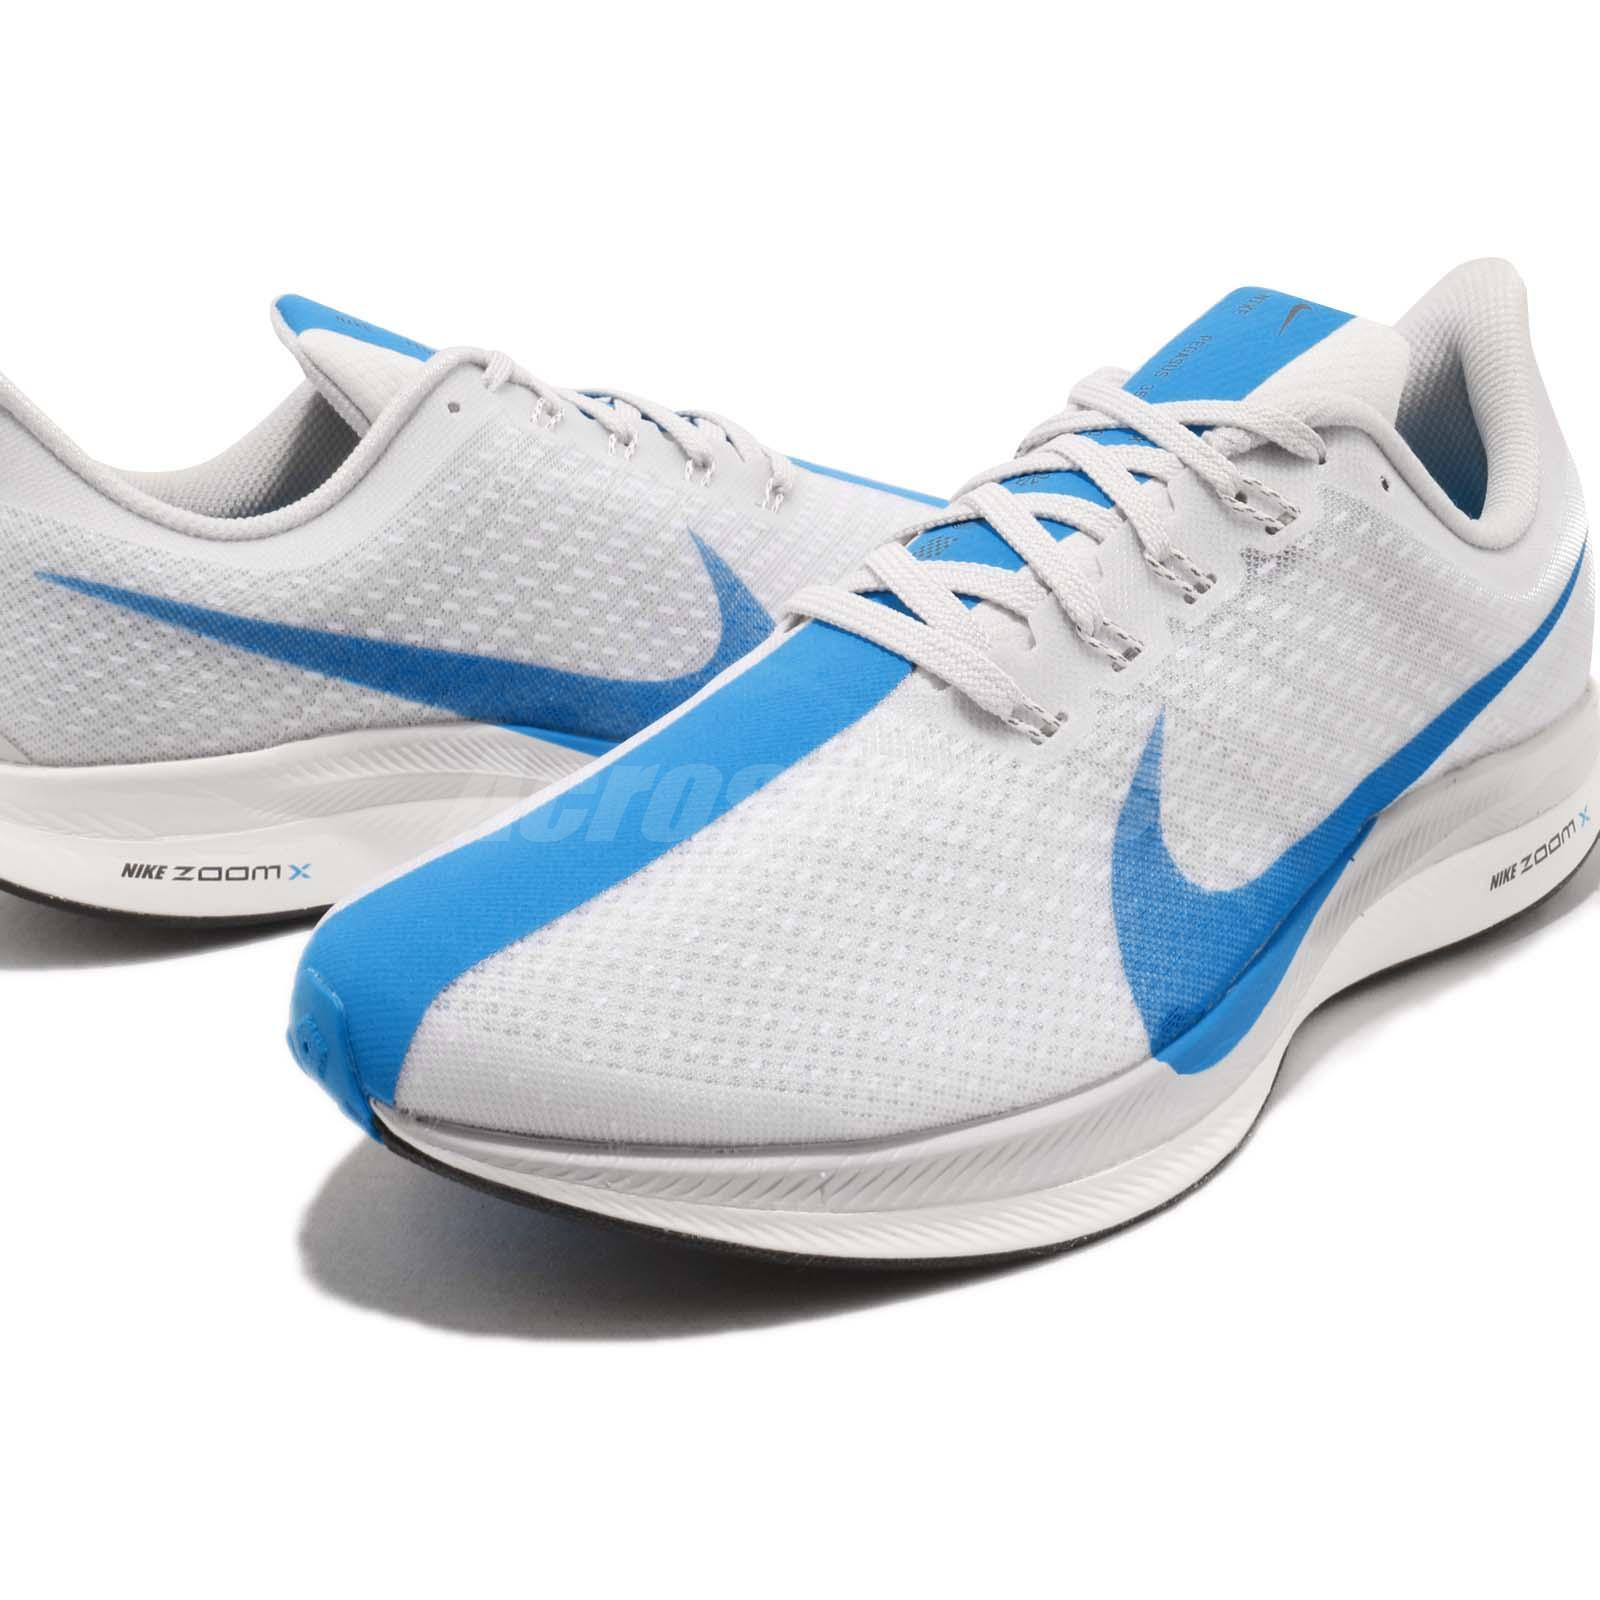 3d94ac65f5048 Nike Zoom Pegasus 35 Turbo White Blue Hero Grey Mens Running Shoes ...